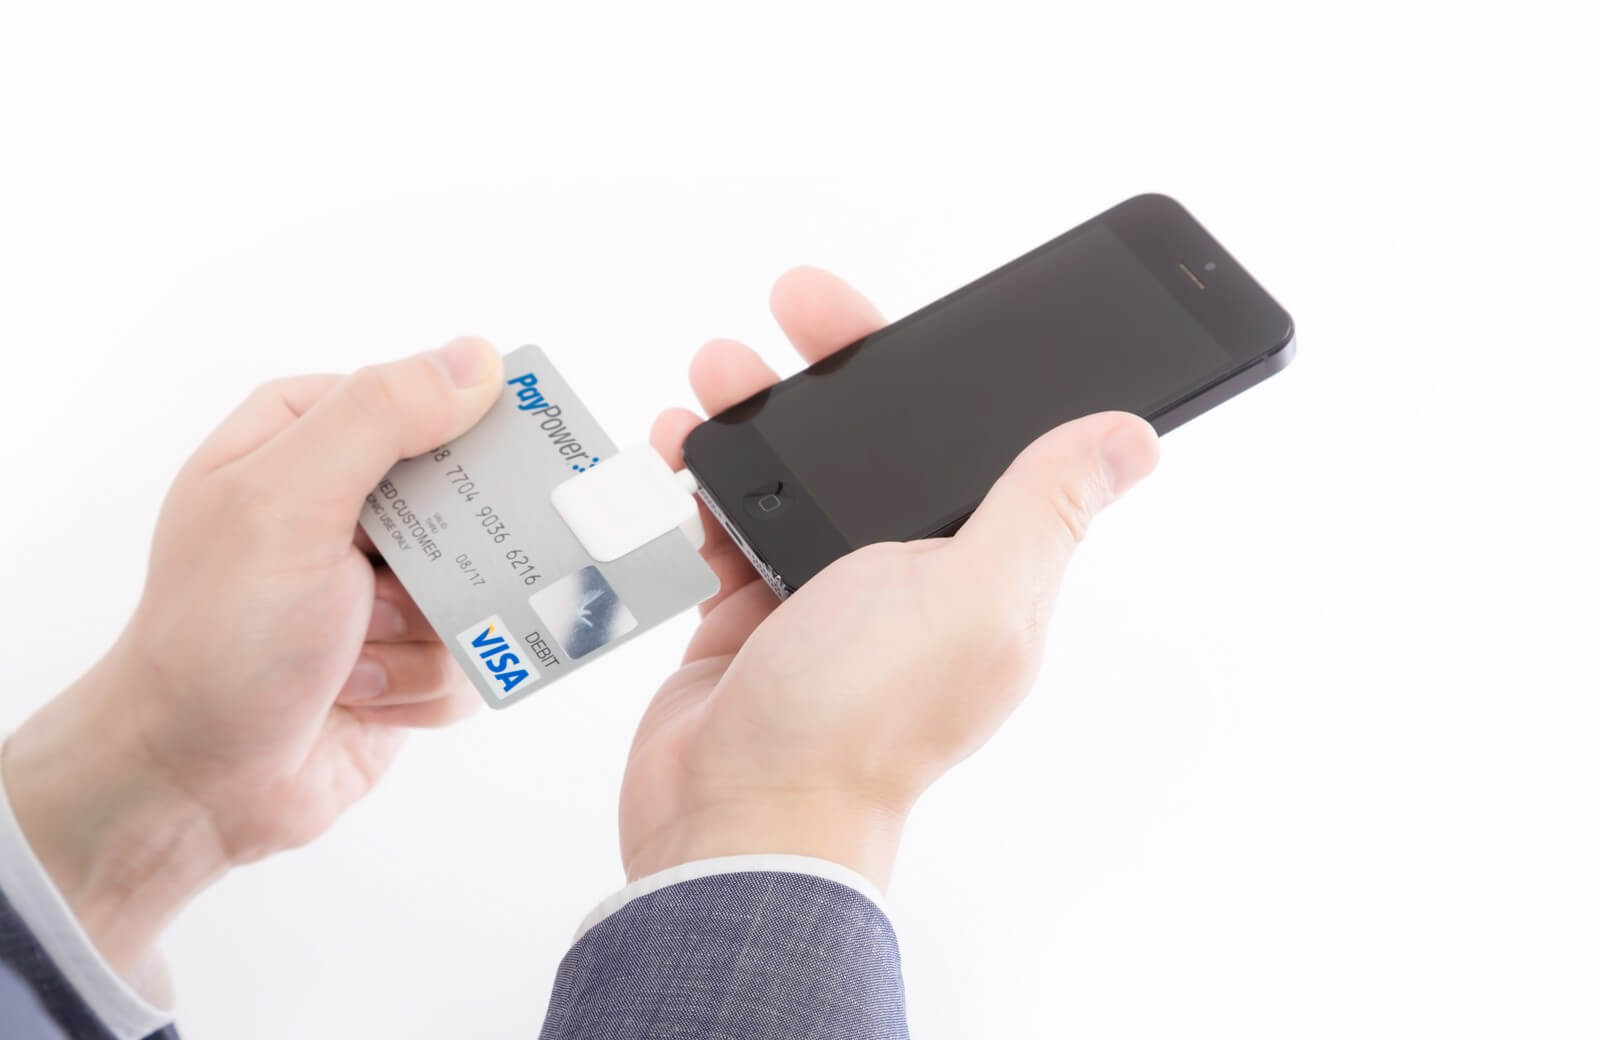 PSNアカウントにクレジットカードを登録したら100円が引き落とされた件について